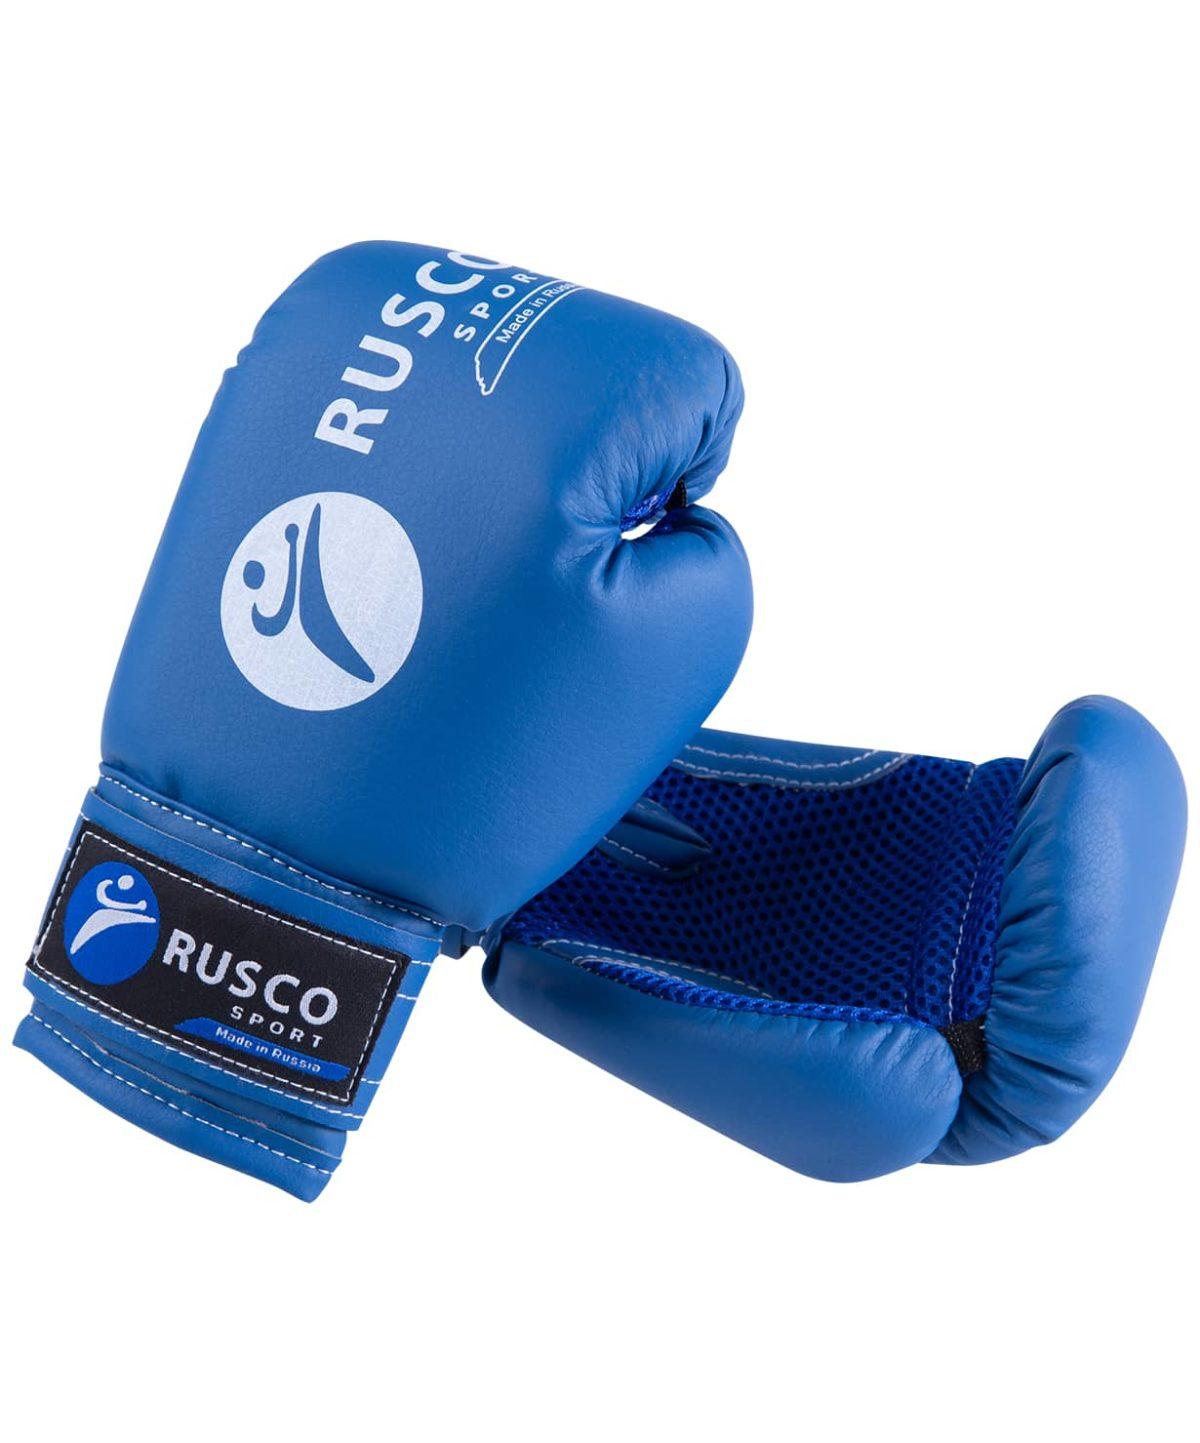 RUSCO Набор для бокса 4oz, к/з  18124 - 3